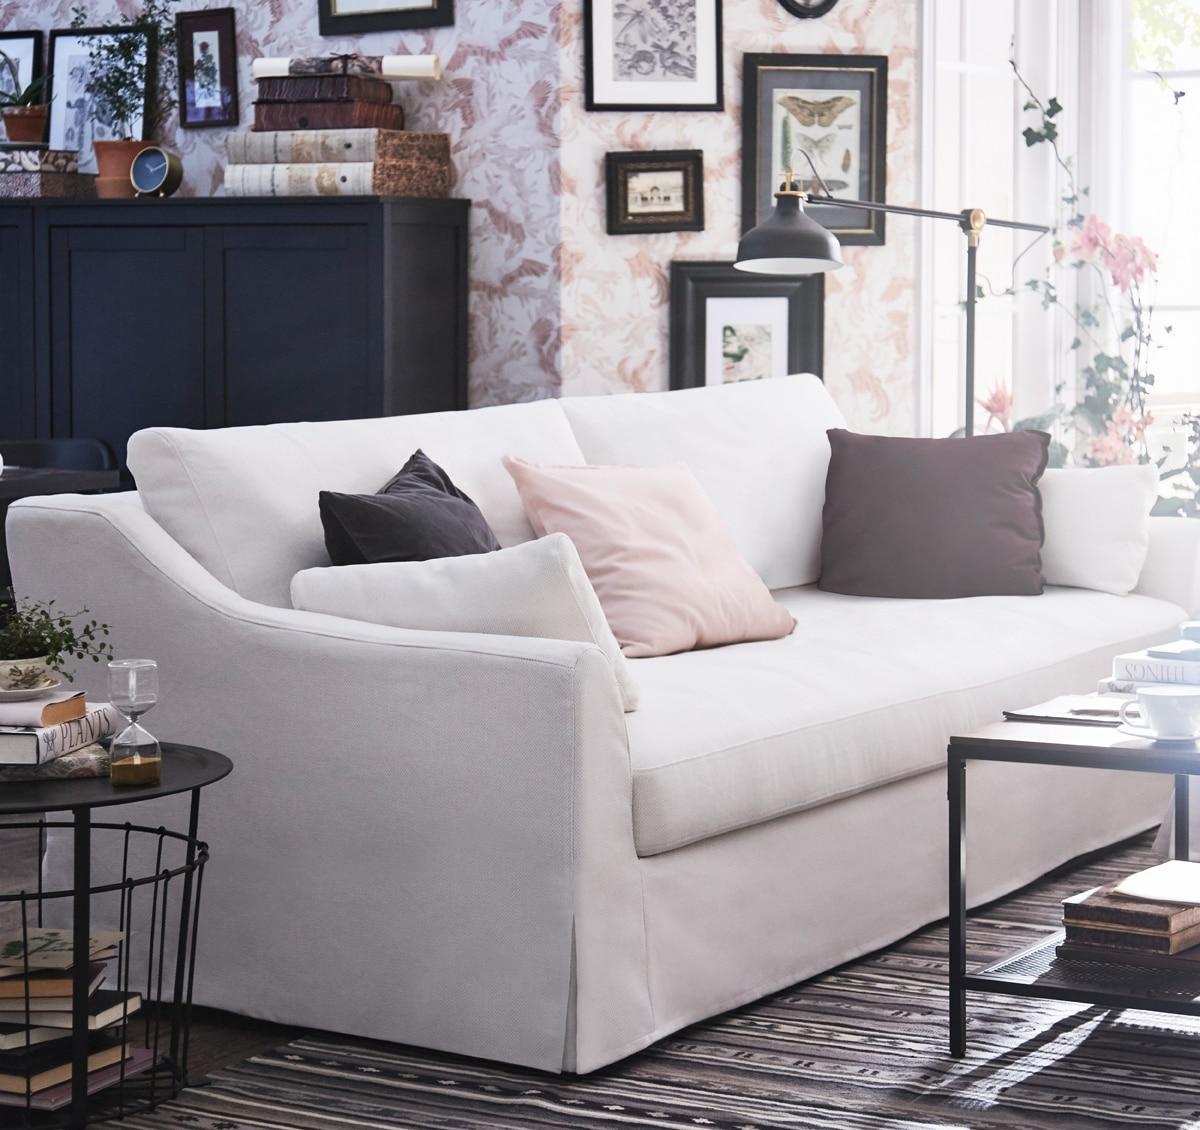 FÄRLÖV Sofas - IKEA